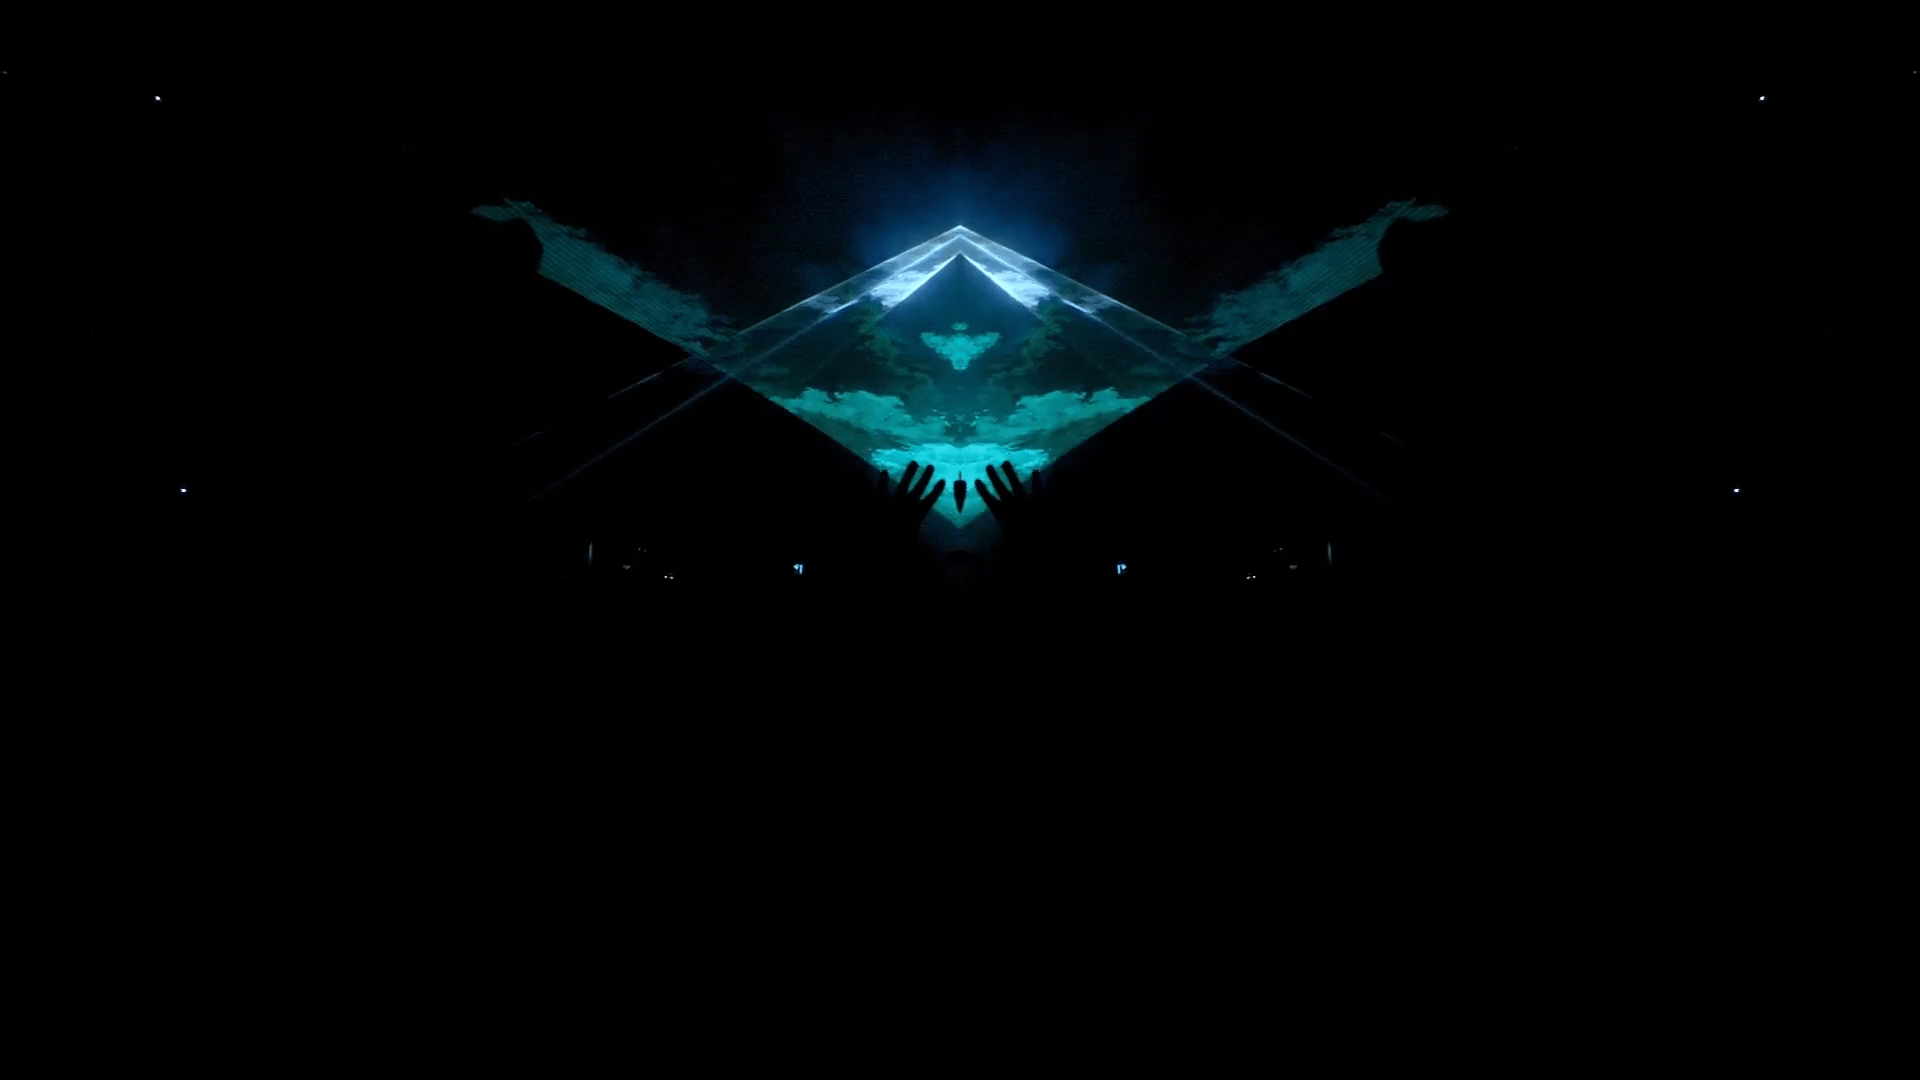 Gravity Falls Hd Wallpaper 1080p Illuminati Wallpapers Wallpaper Cave